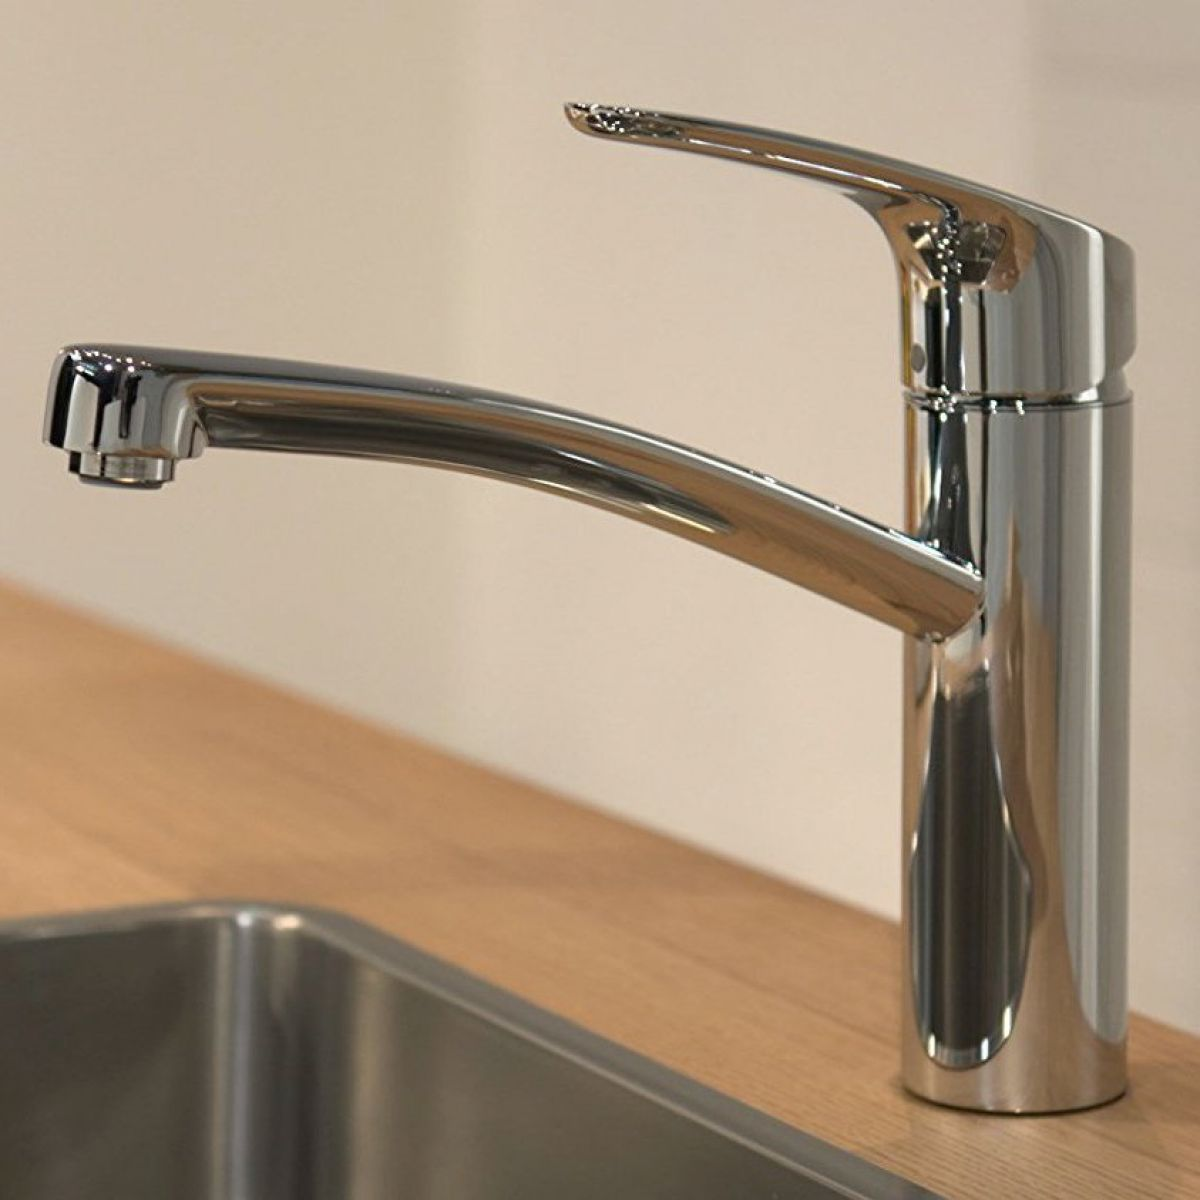 hansgrohe focus 160 kitchen mixer tap uk bathrooms. Black Bedroom Furniture Sets. Home Design Ideas